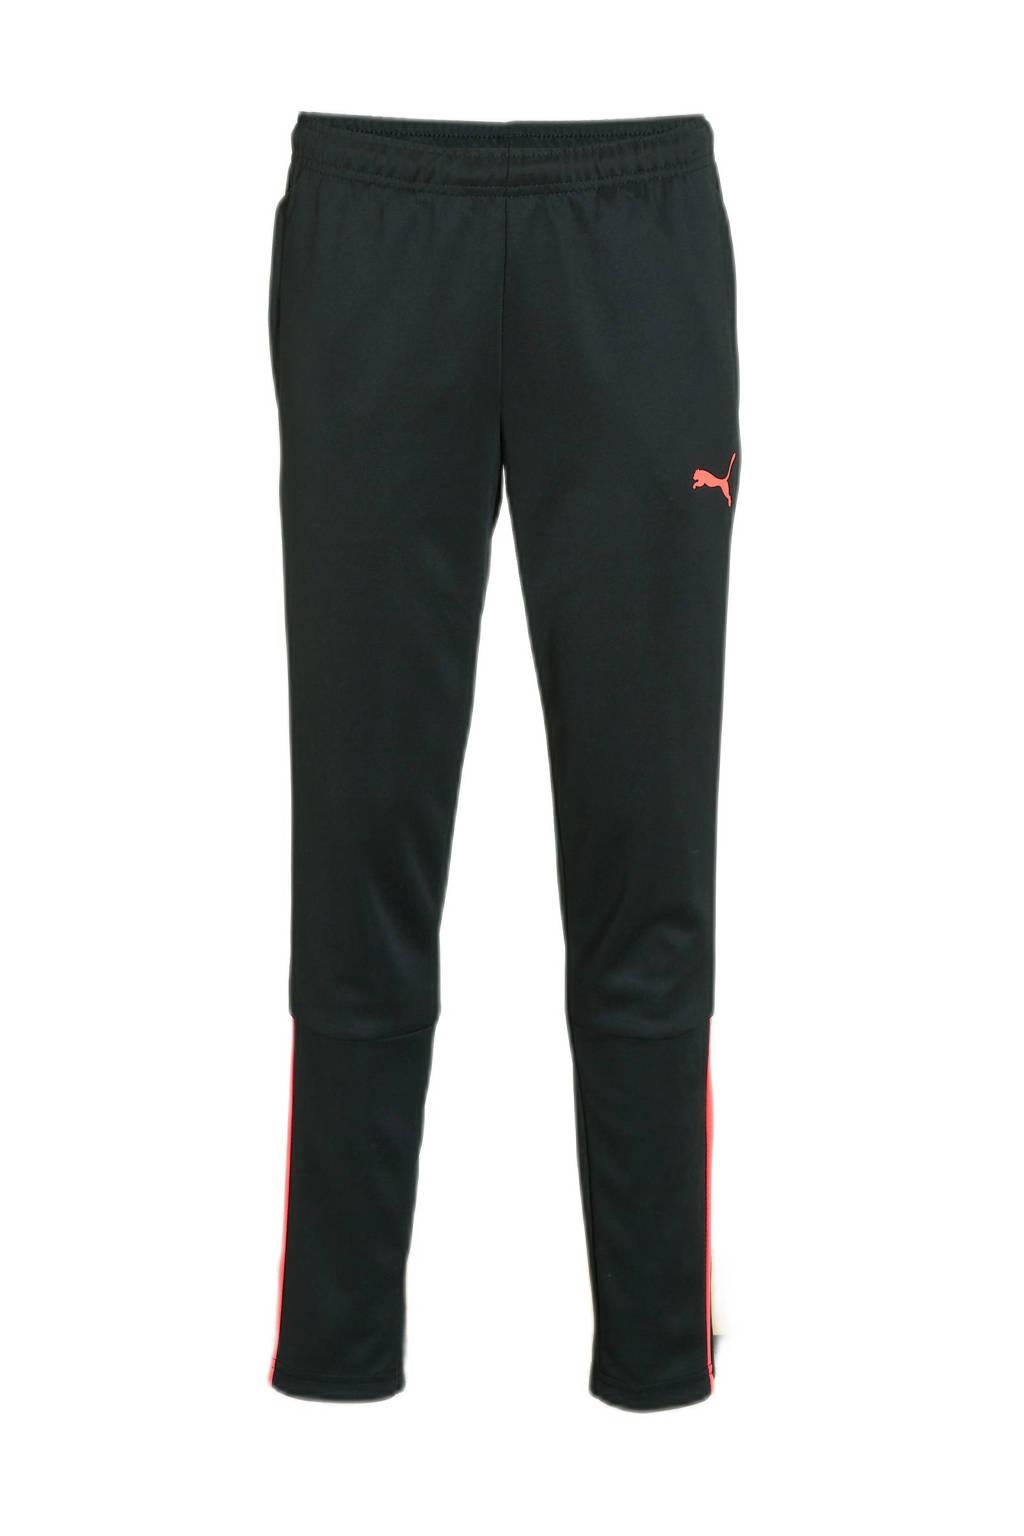 Puma   trainingsbroek zwart/roze, Zwart/roze